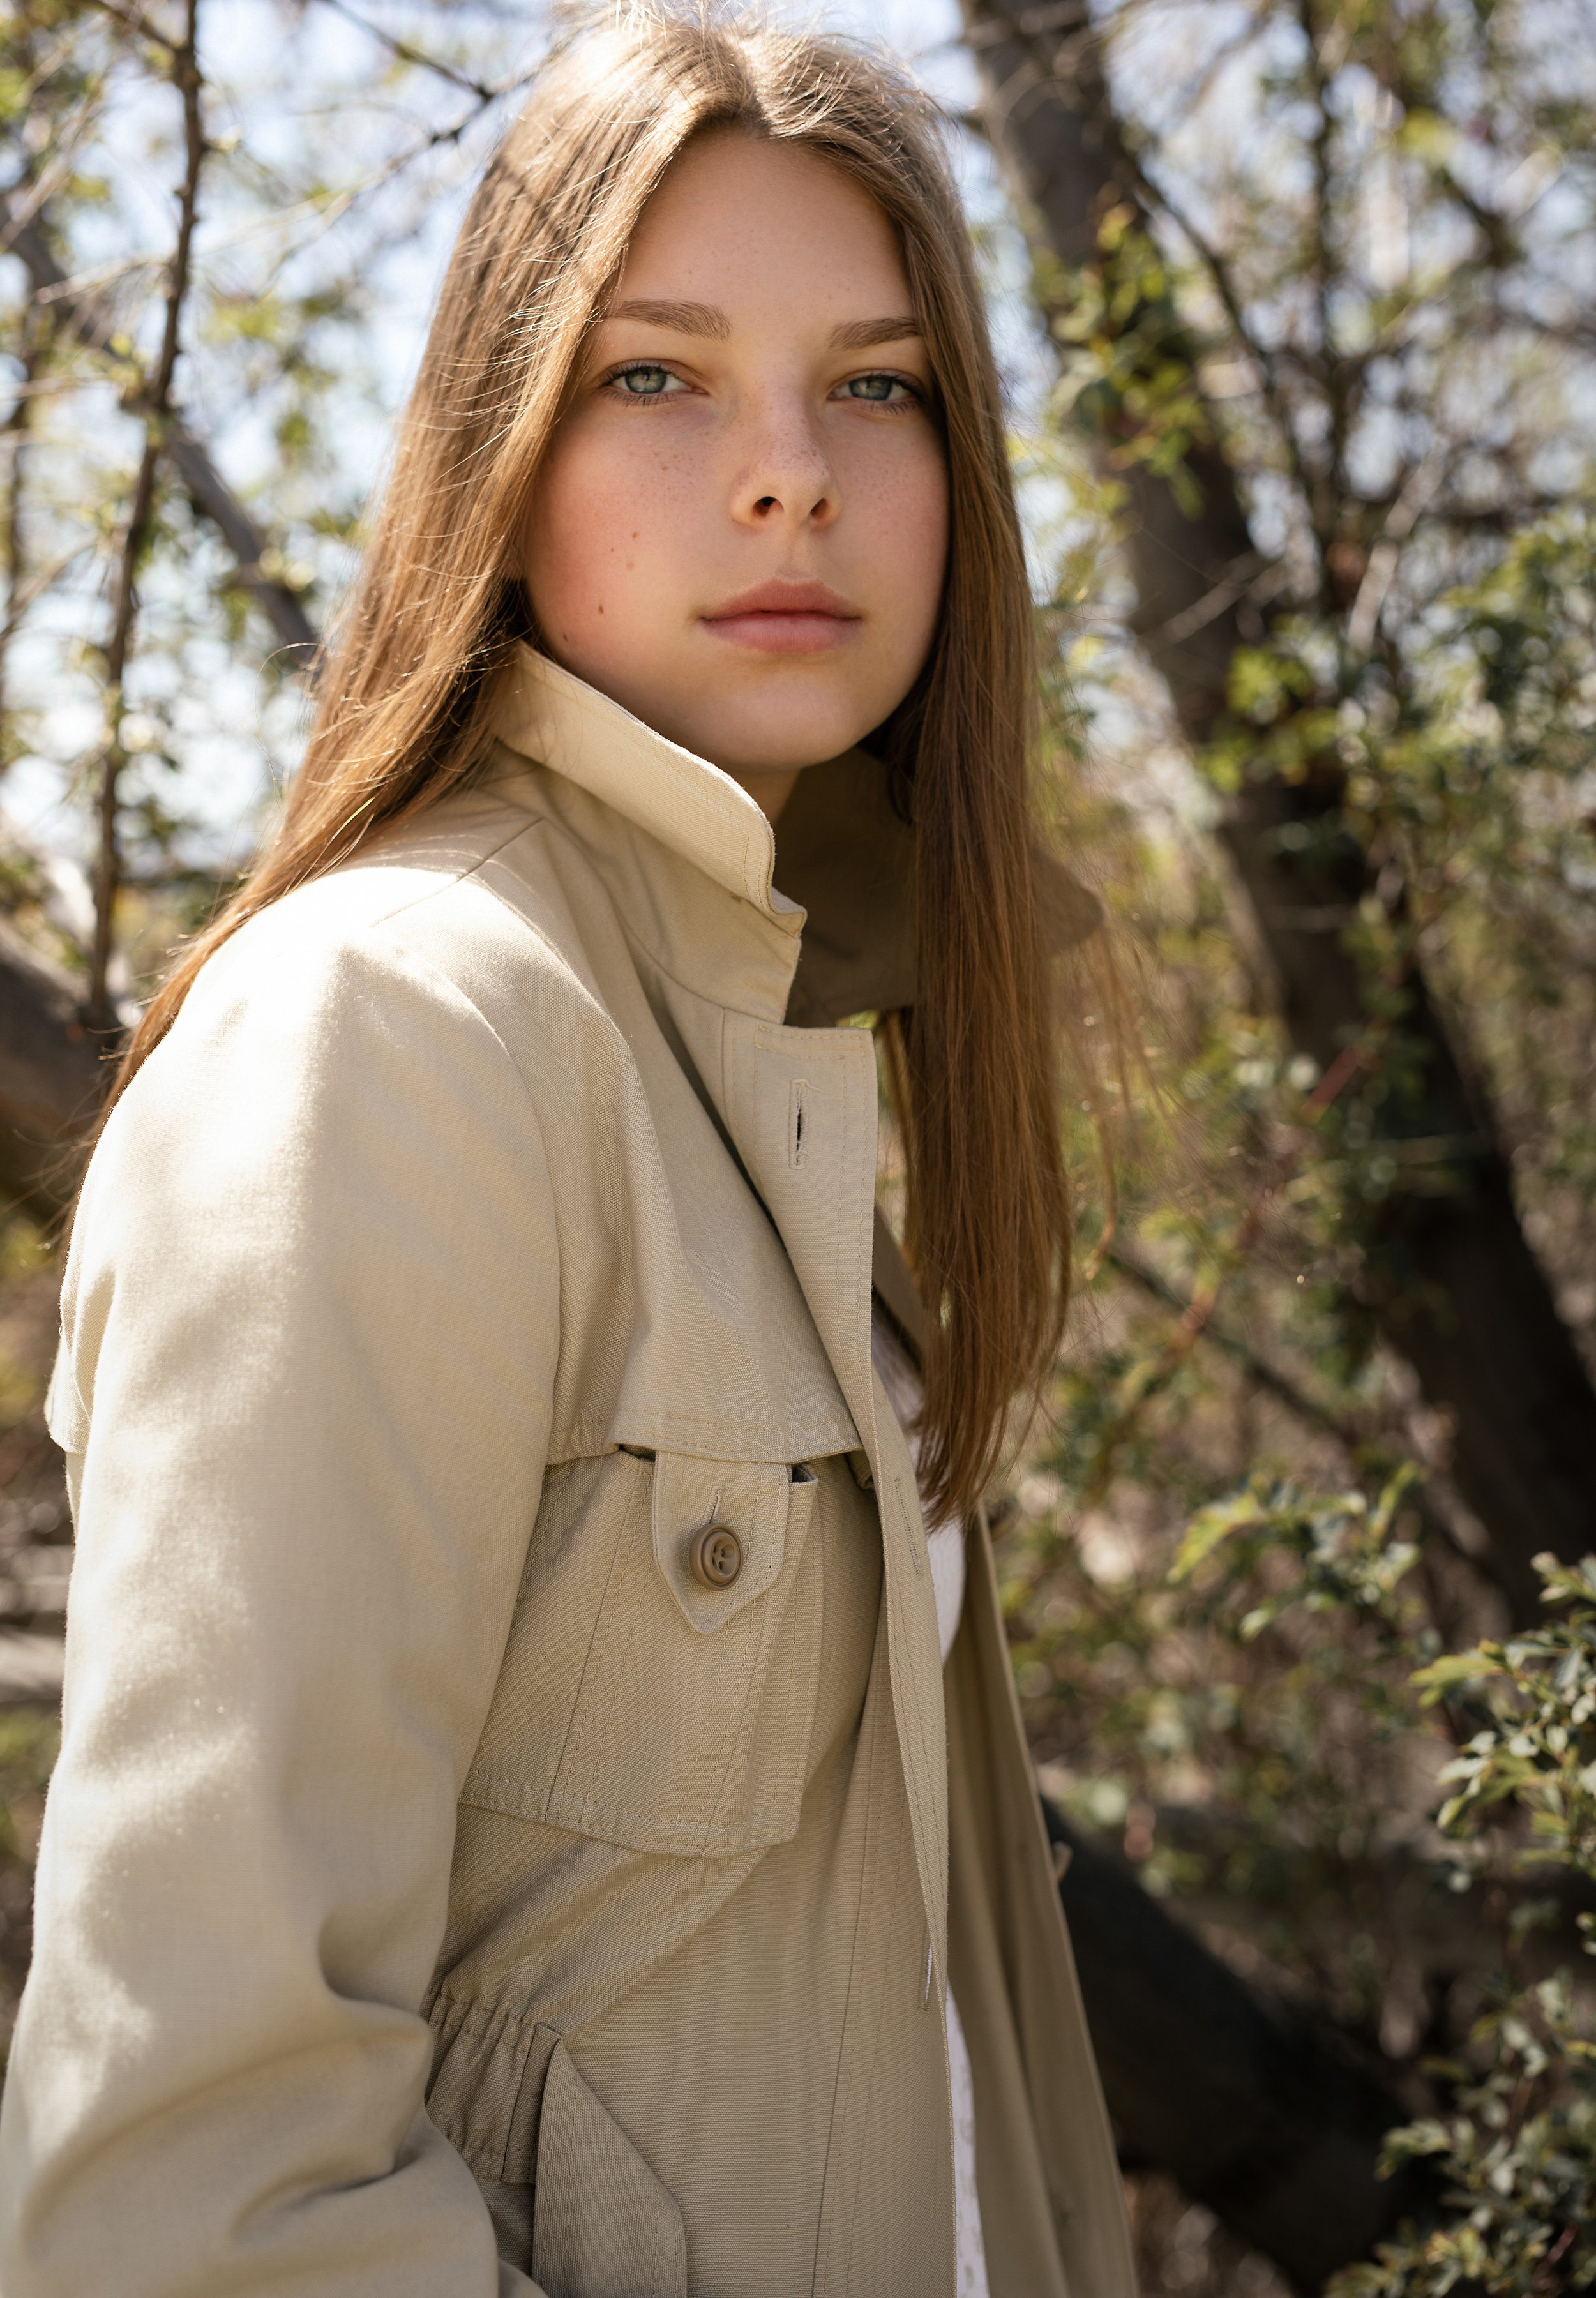 Ava in her most recent test shoot by Nadya Ward wearing Georgie Girl Vintage. Shot in Kelowna.